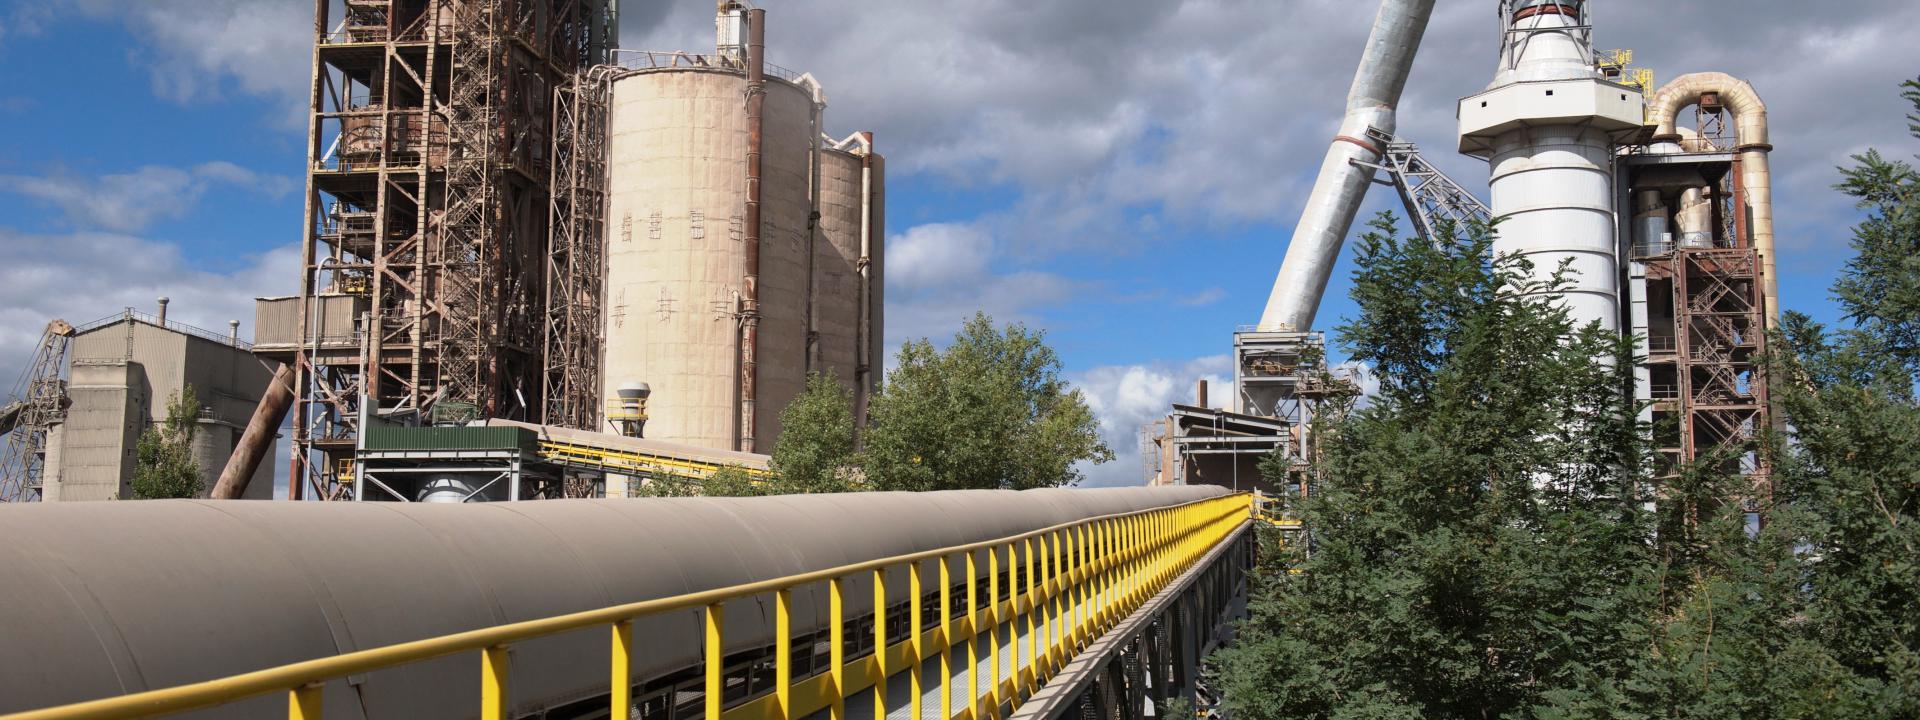 environmental economics 4th canadian edition pdf field